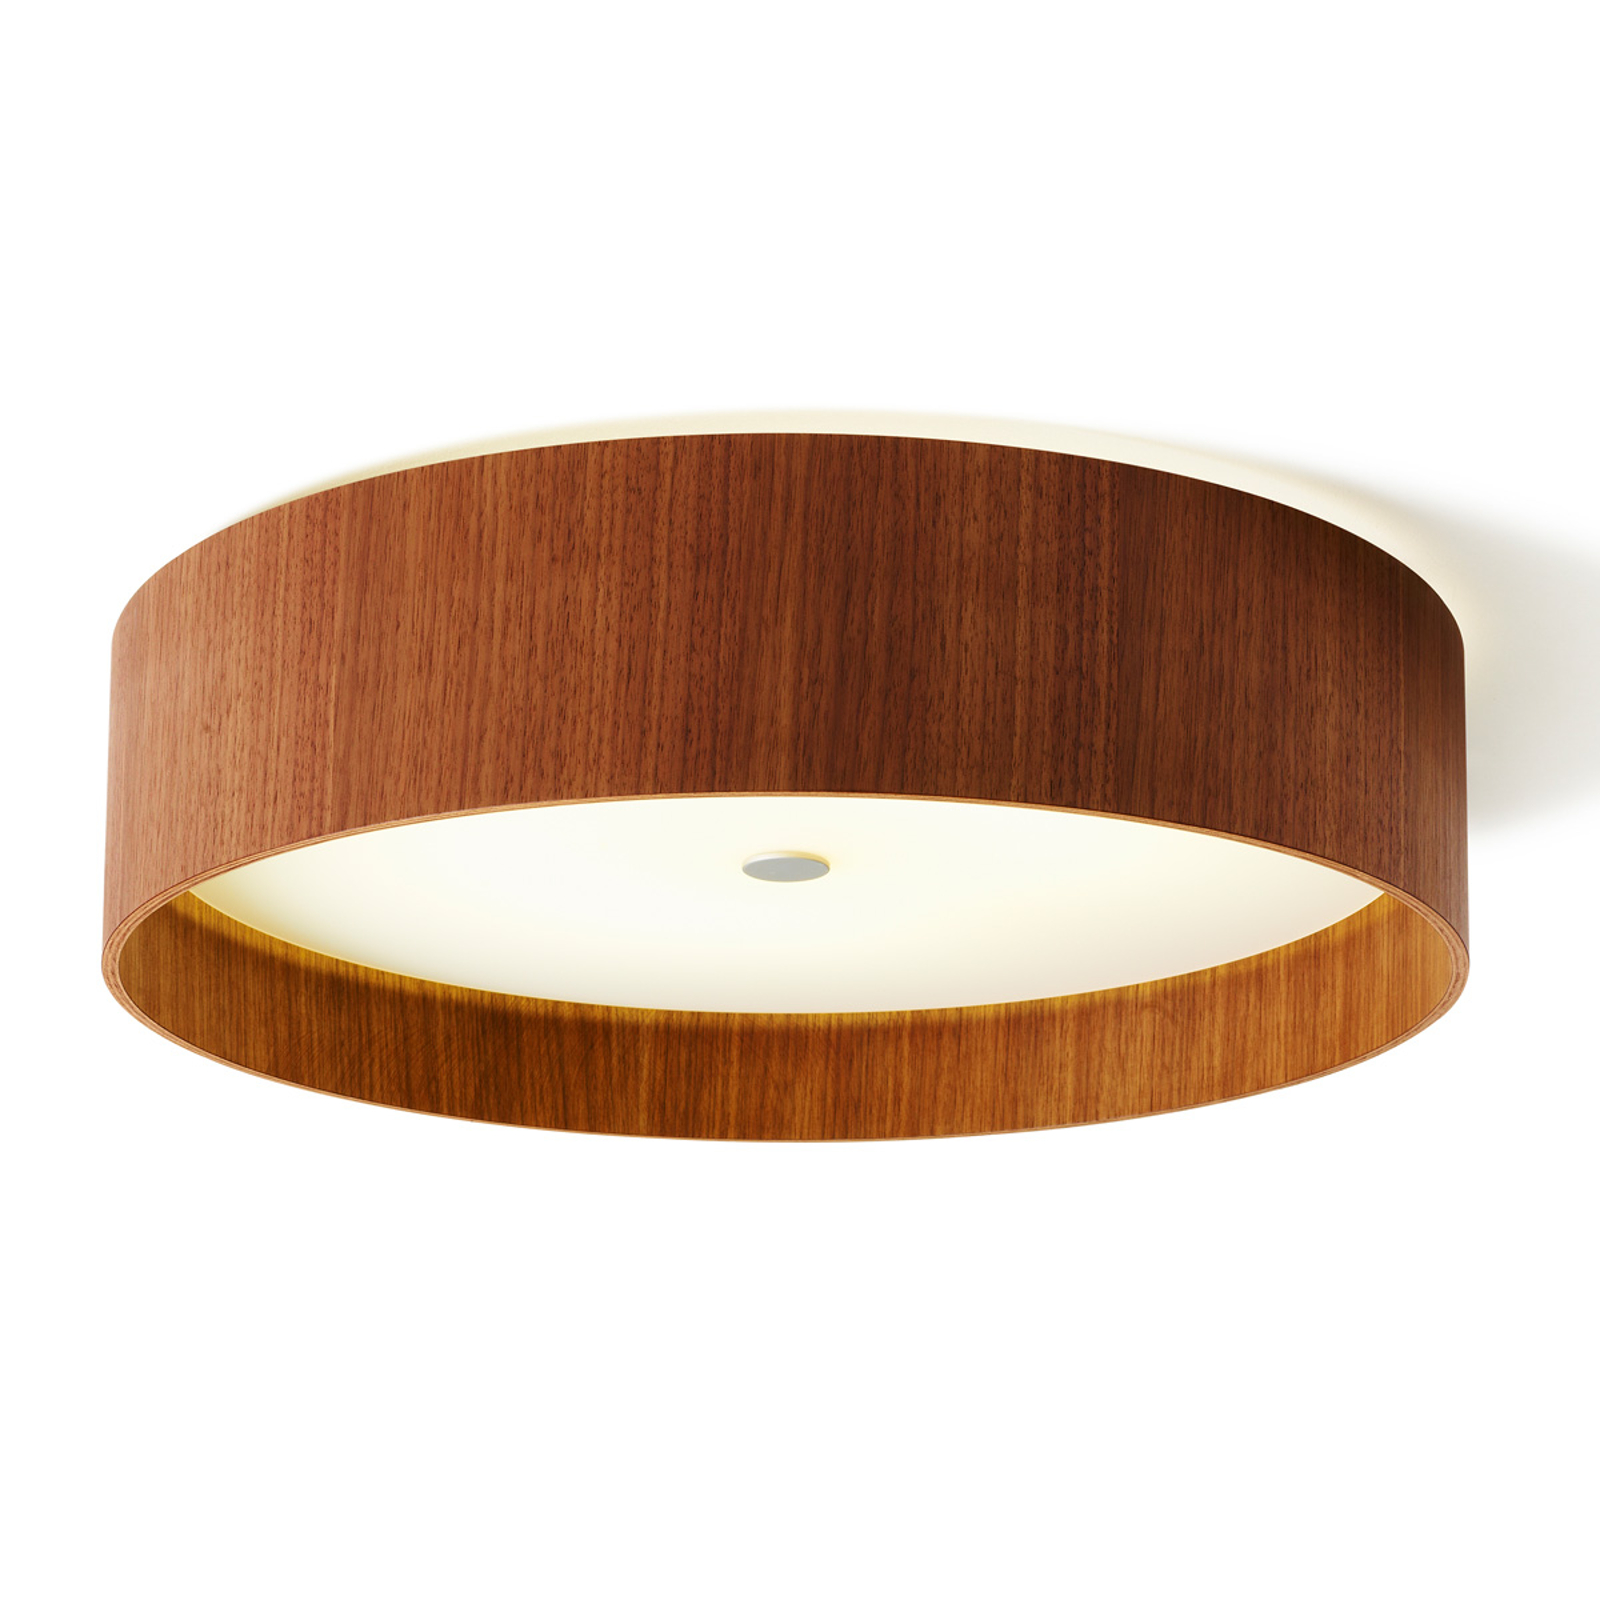 LARAwood - lampa sufitowa LED z orzecha, 55 cm